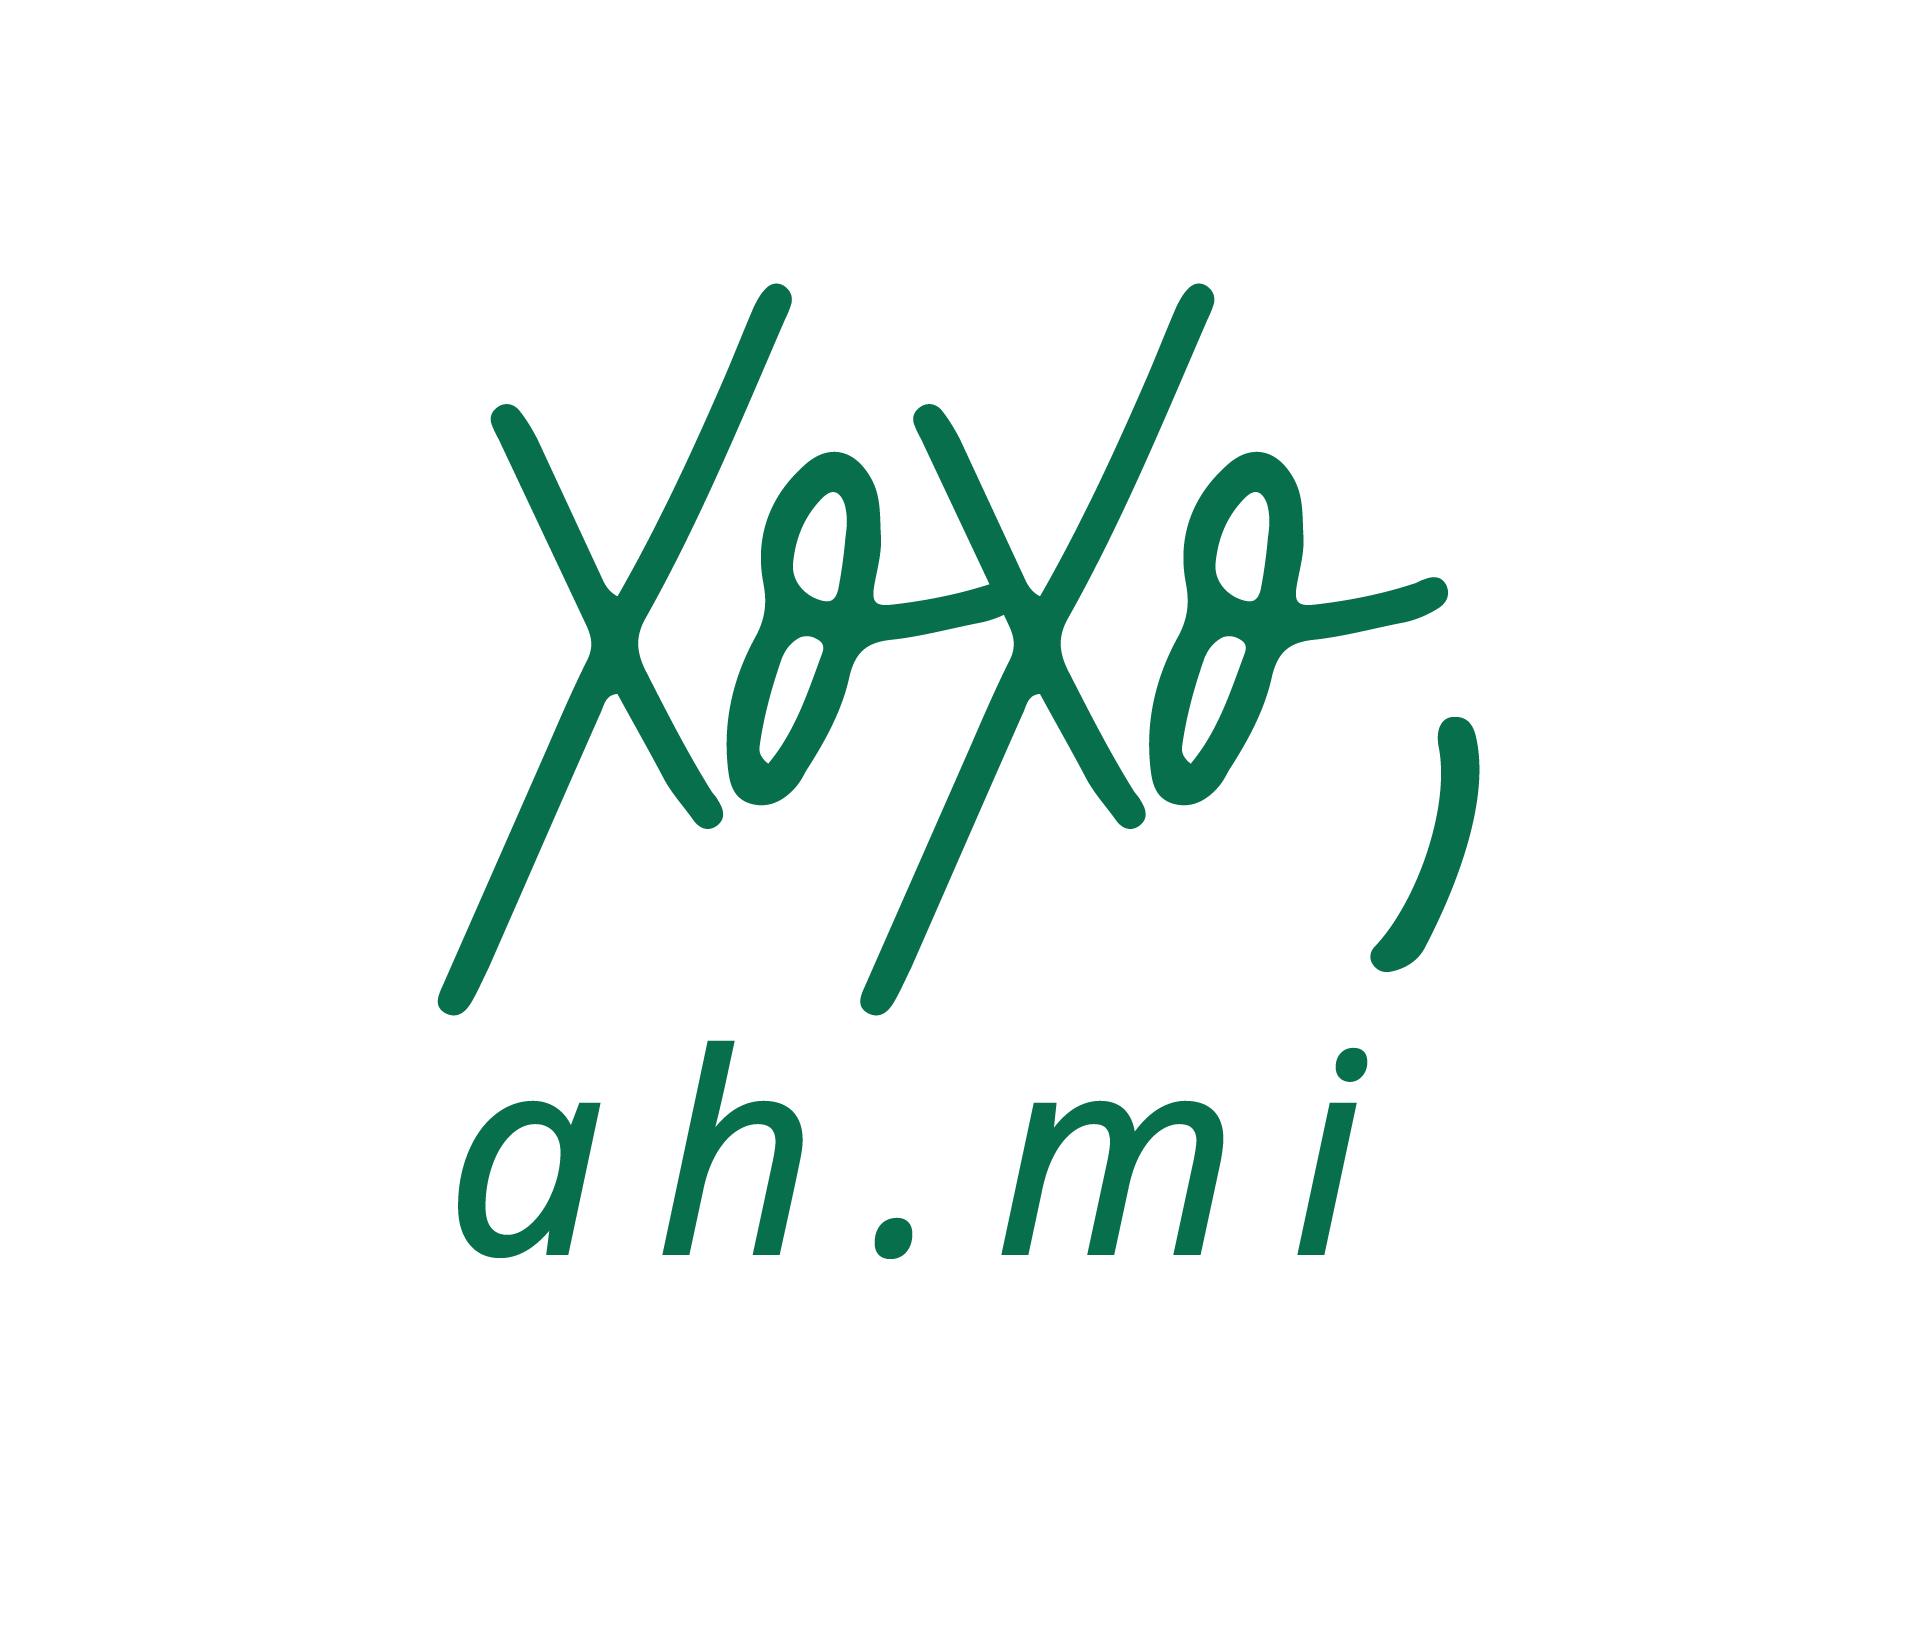 xoxo3.png